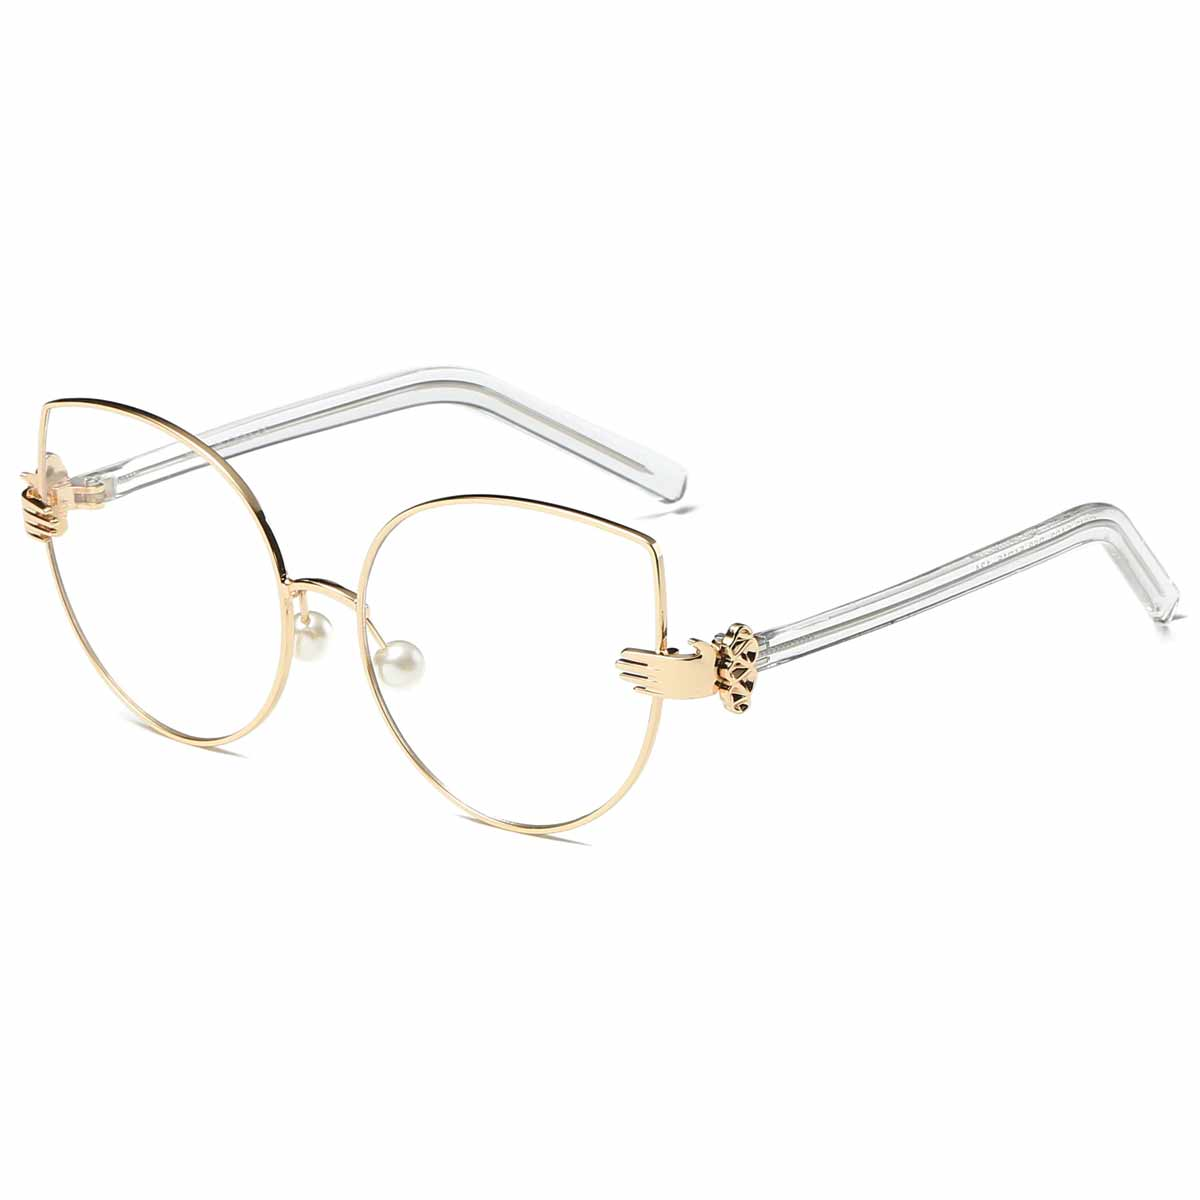 Granny chic Blue Light Blocking Glasses